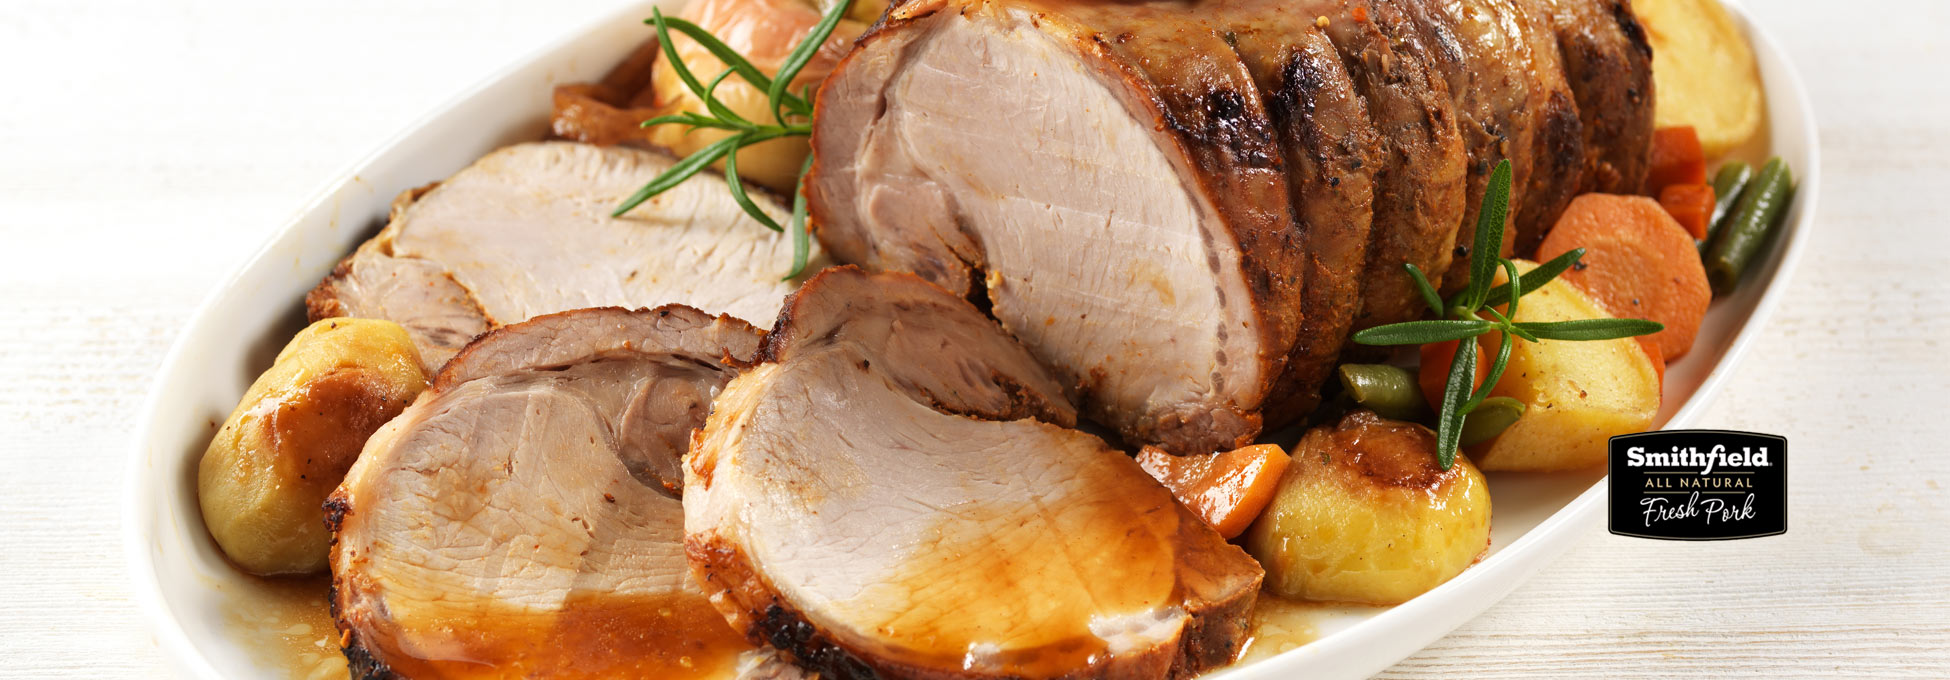 trigs-homepg-smithfield-pork-roast.jpg